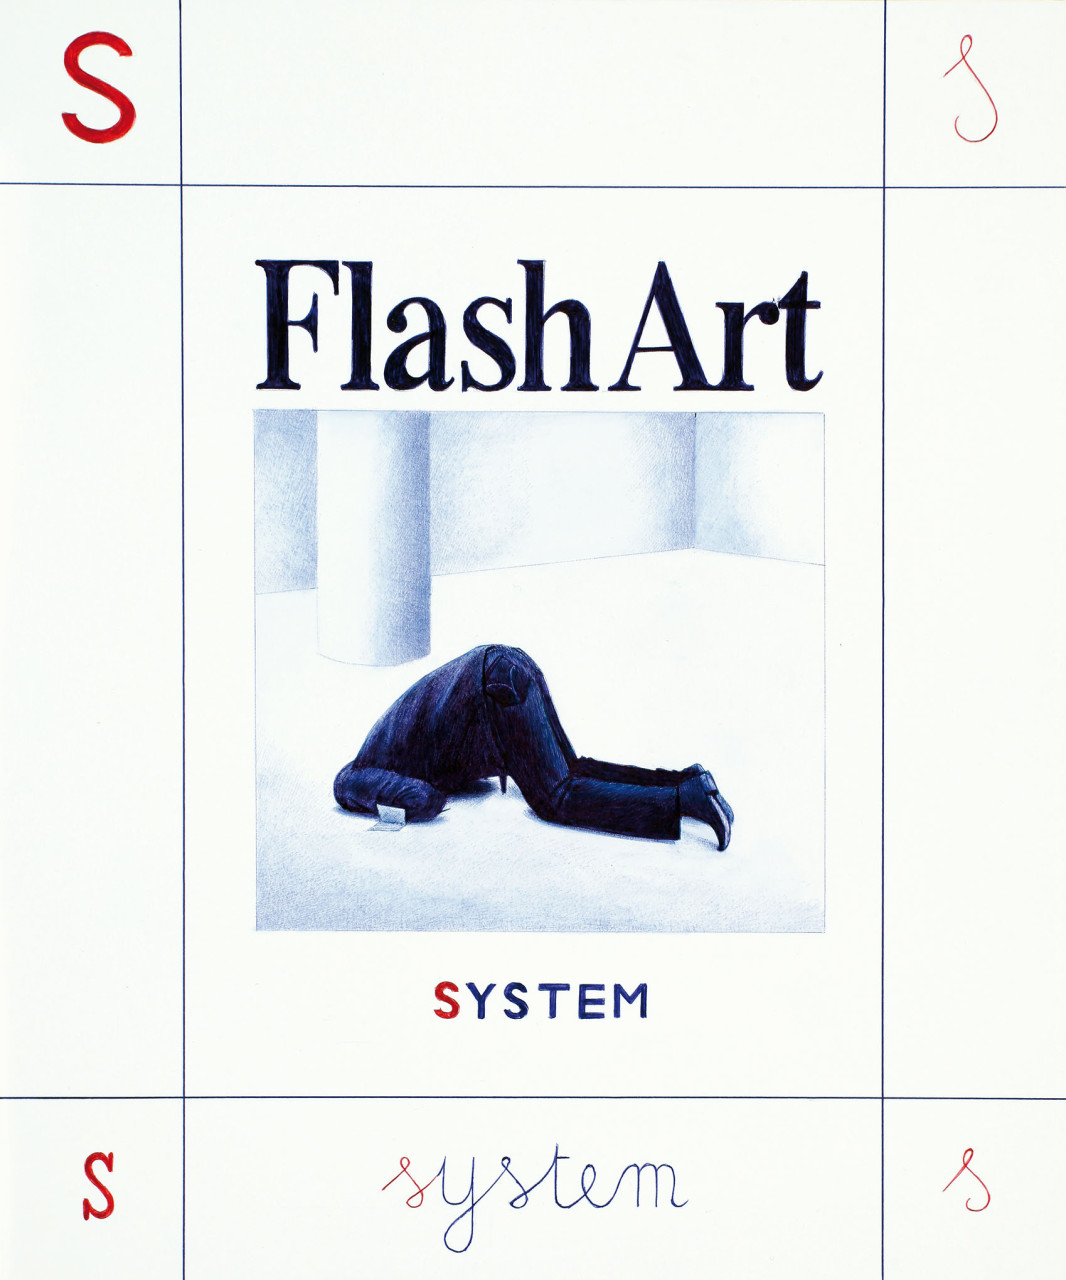 05S-system_bassa